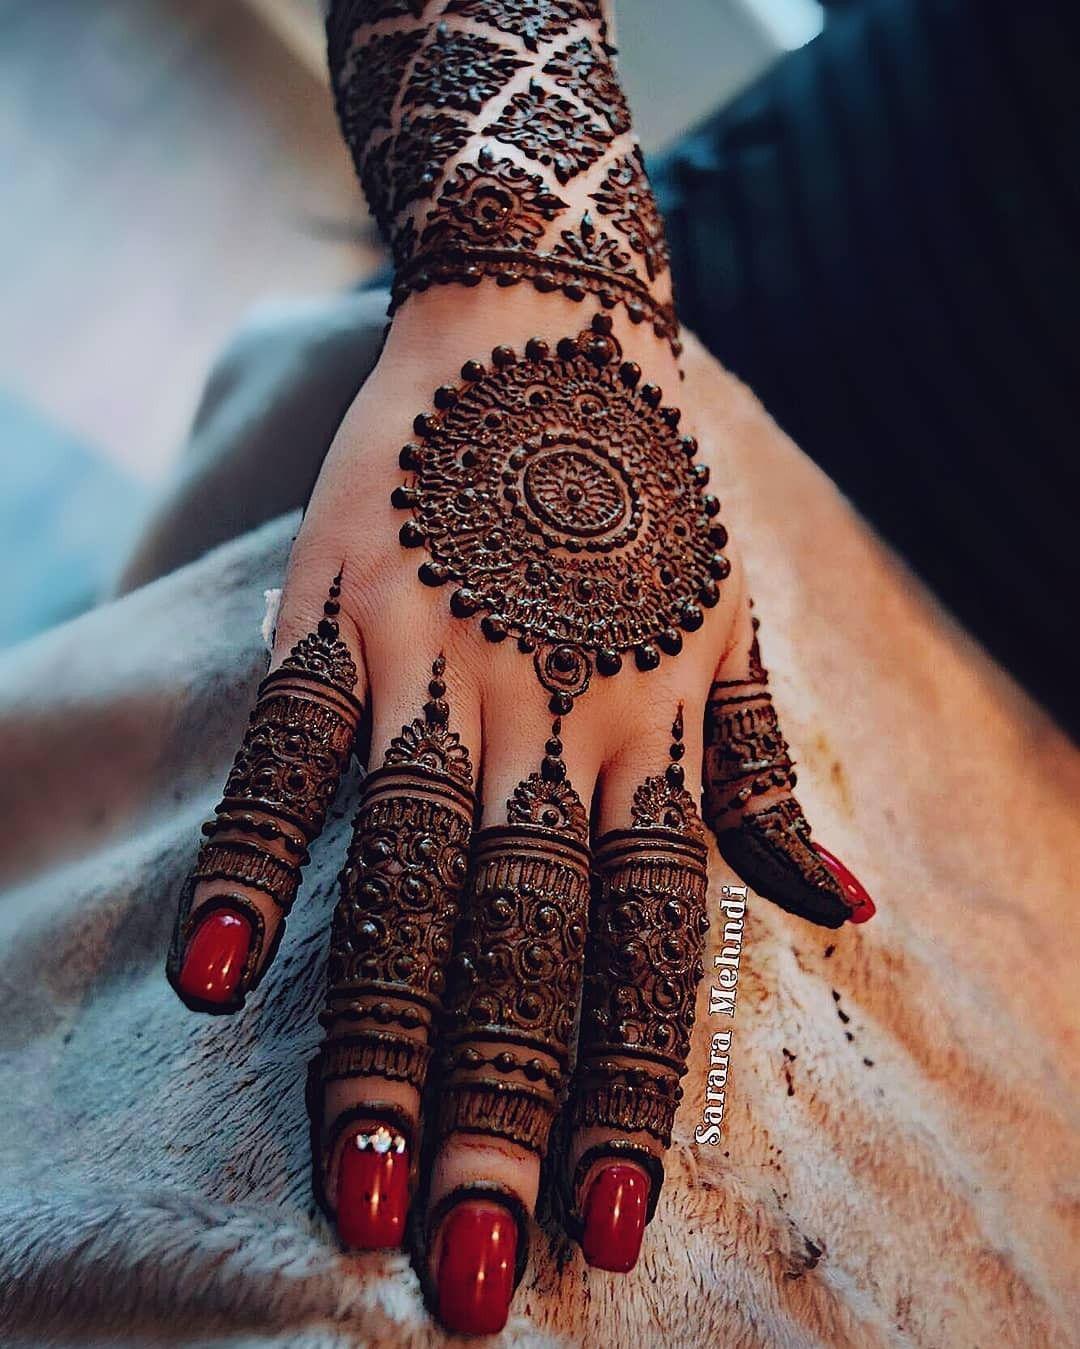 Pin By Neetu Gagan Gauba On Mehndi: Mehndi, Henna, Mehndi Designs